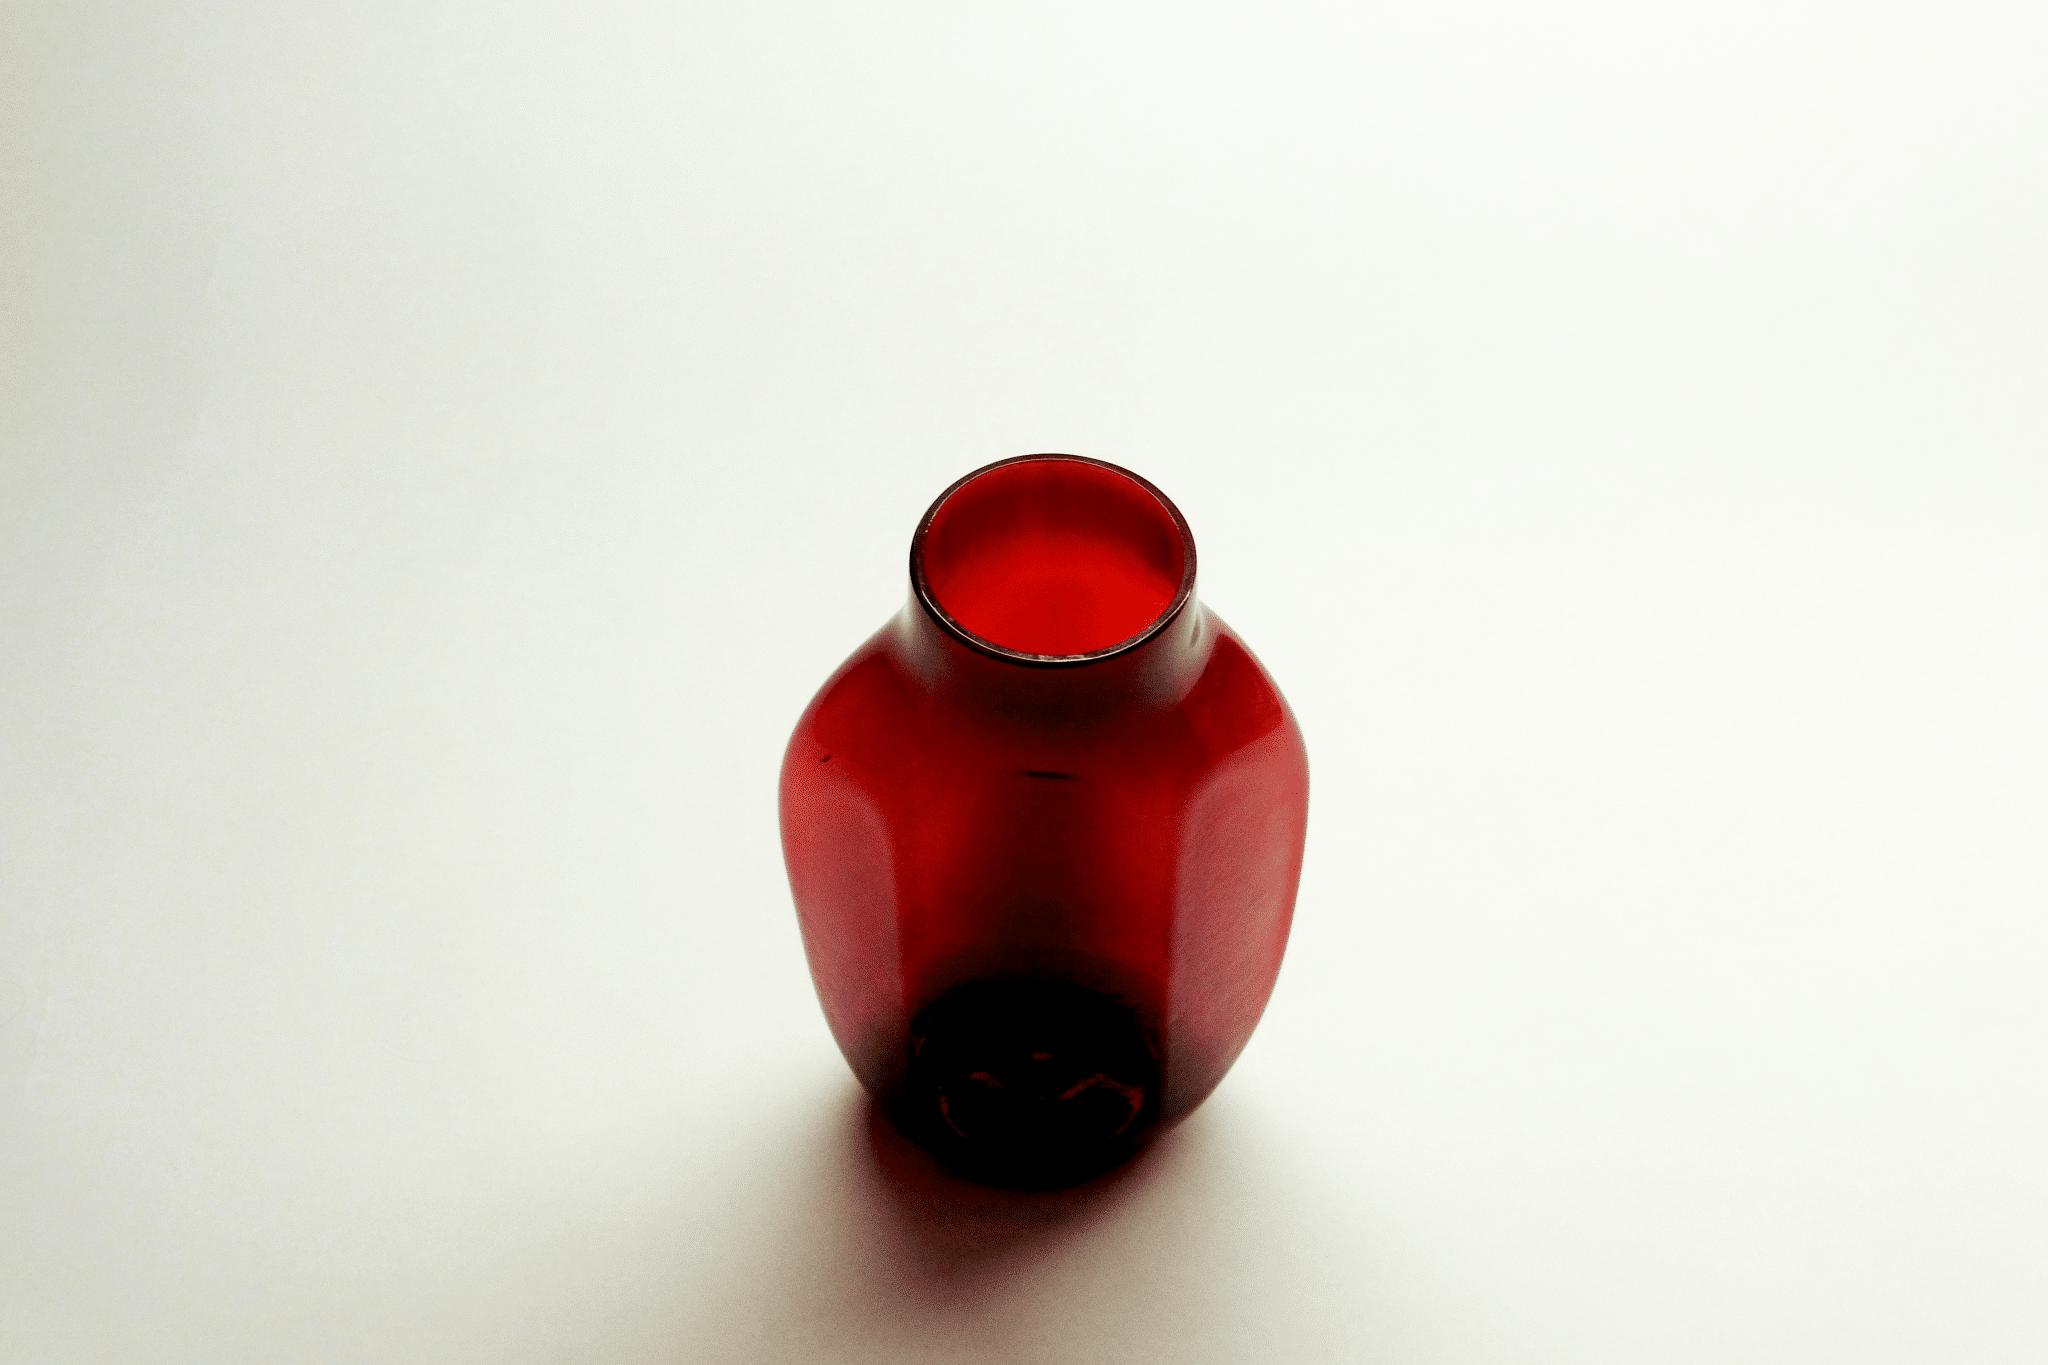 P102066